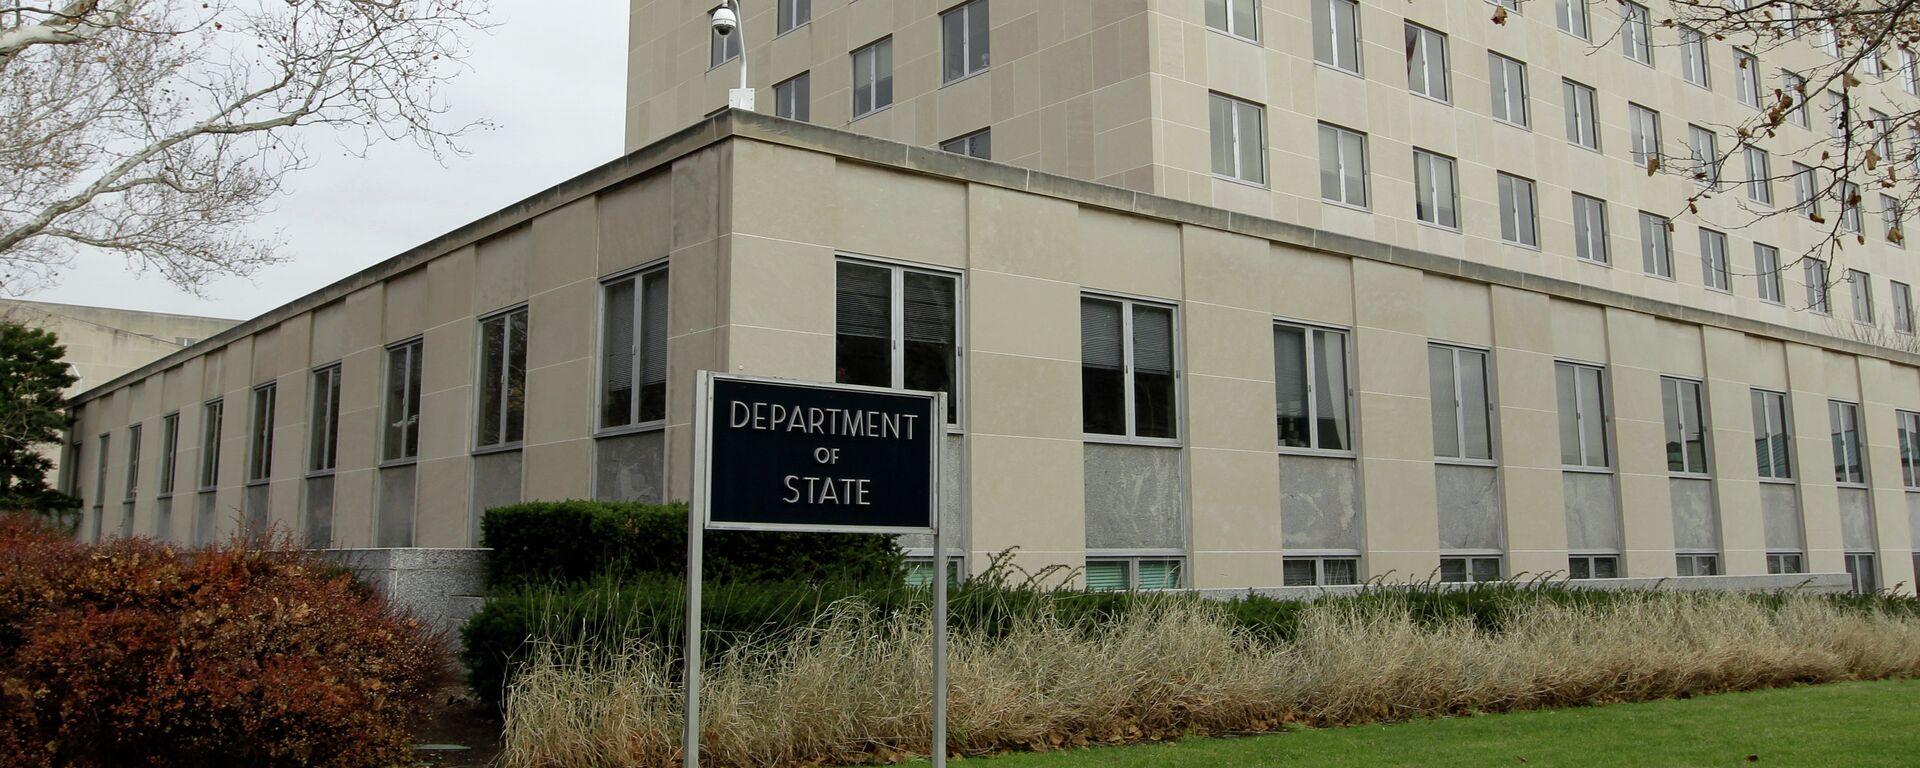 Departamento de Estado de EEUU - Sputnik Mundo, 1920, 29.07.2021